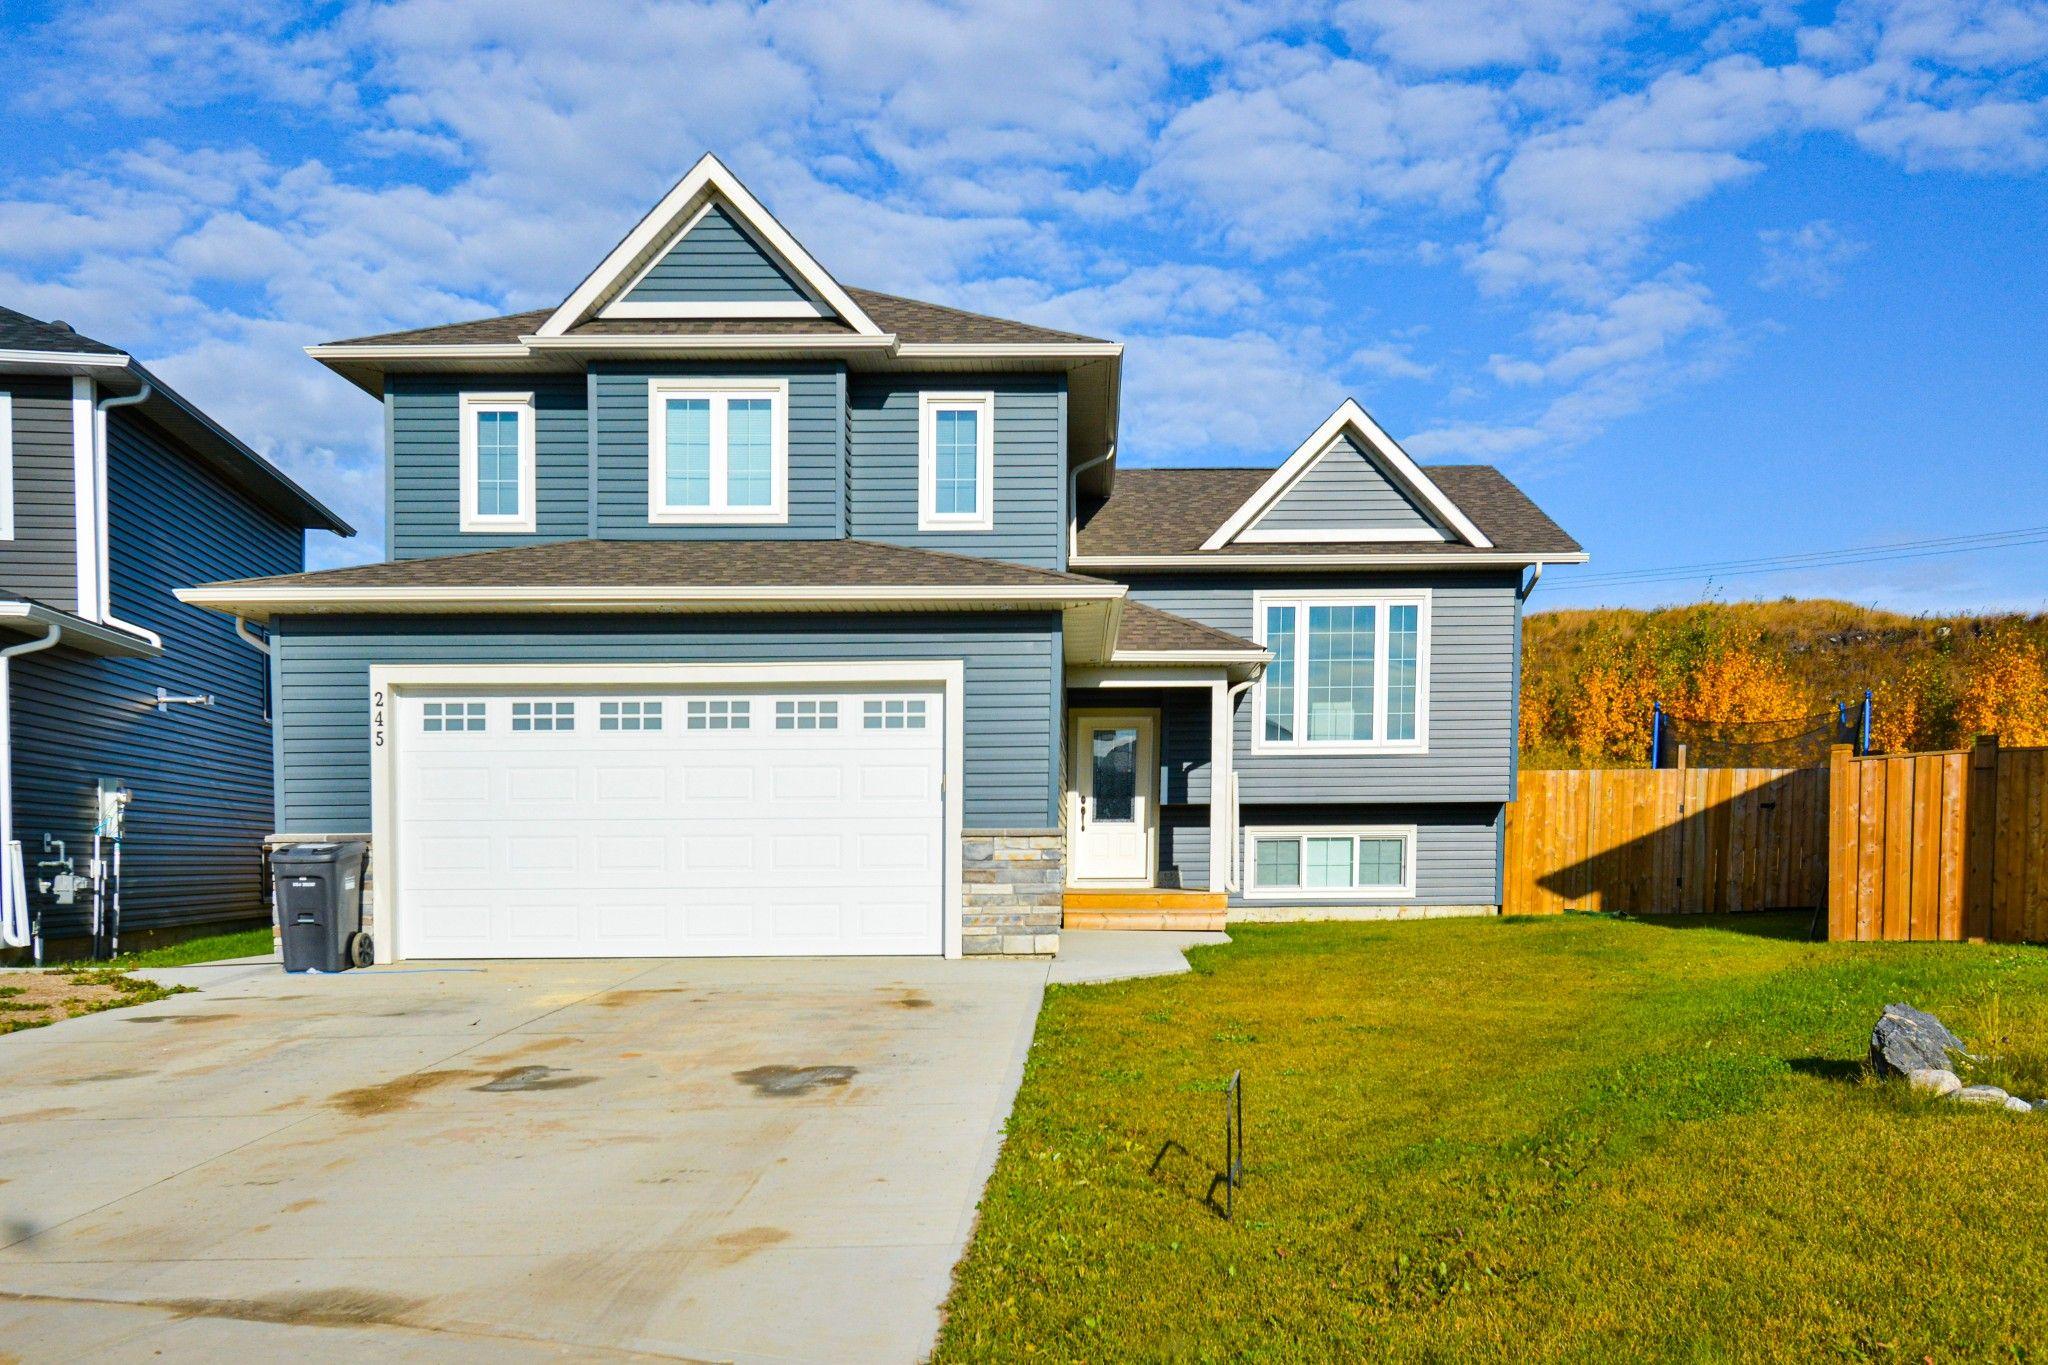 Main Photo: 245 Terra Nova Crescent: Cold Lake House for sale : MLS®# E4222209